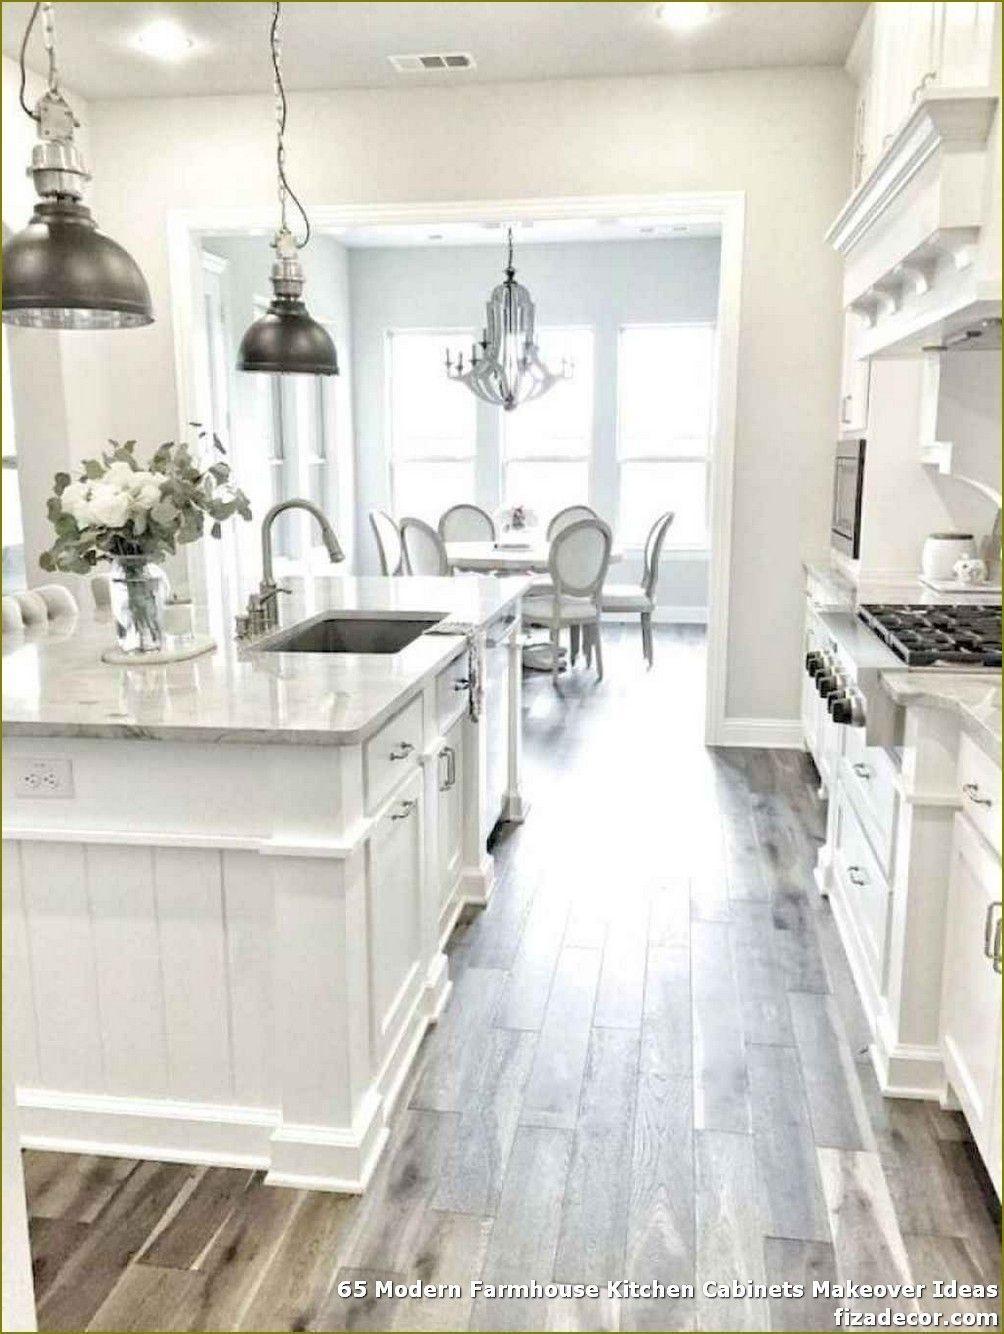 35 Amazingly Creative And Stylish Farmhouse Kitchen Ideas Antique White Kitchen Antique White Kitchen Cabinets Kitchen Cabinet Design